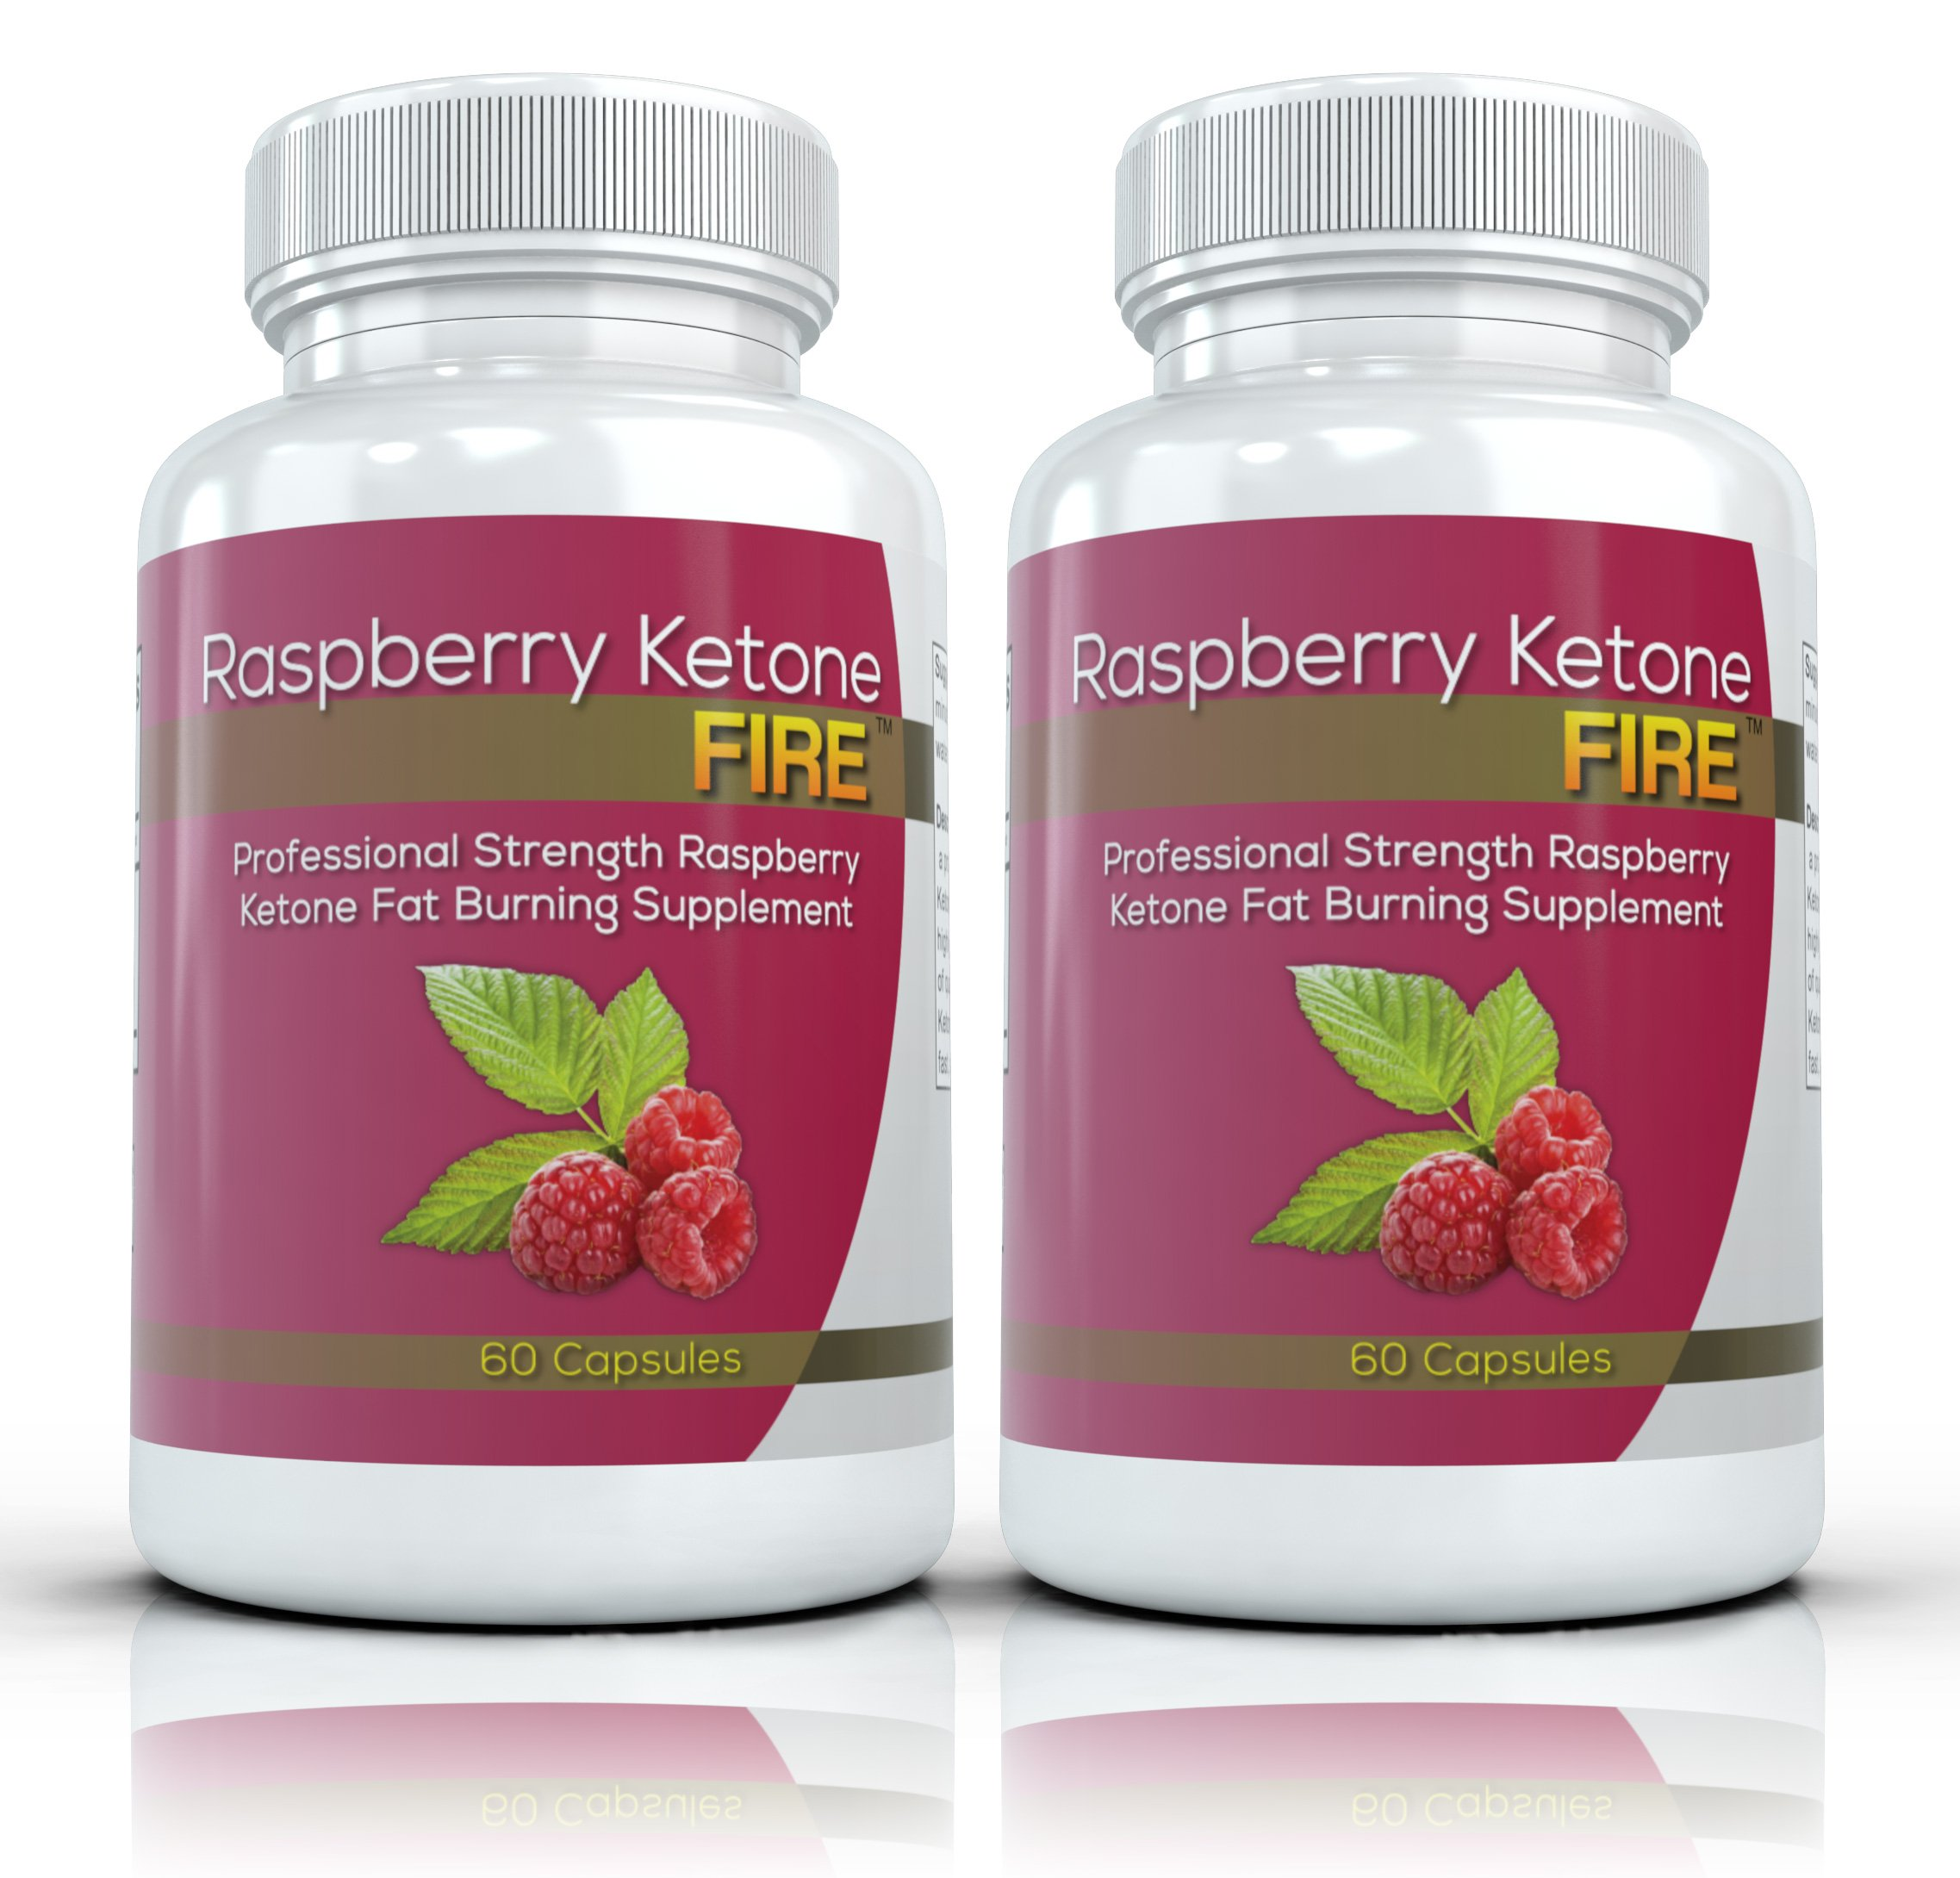 Raspberry Ketone FIRE (2 Bottles) - Professional Strength Raspberry Ketones Fat Burning Formula. The New All Natural Weight Loss Supplement. 250mg (60 Capsules per Bottle) by Raspberry Ketone Fire Professional Strength Fat Burner